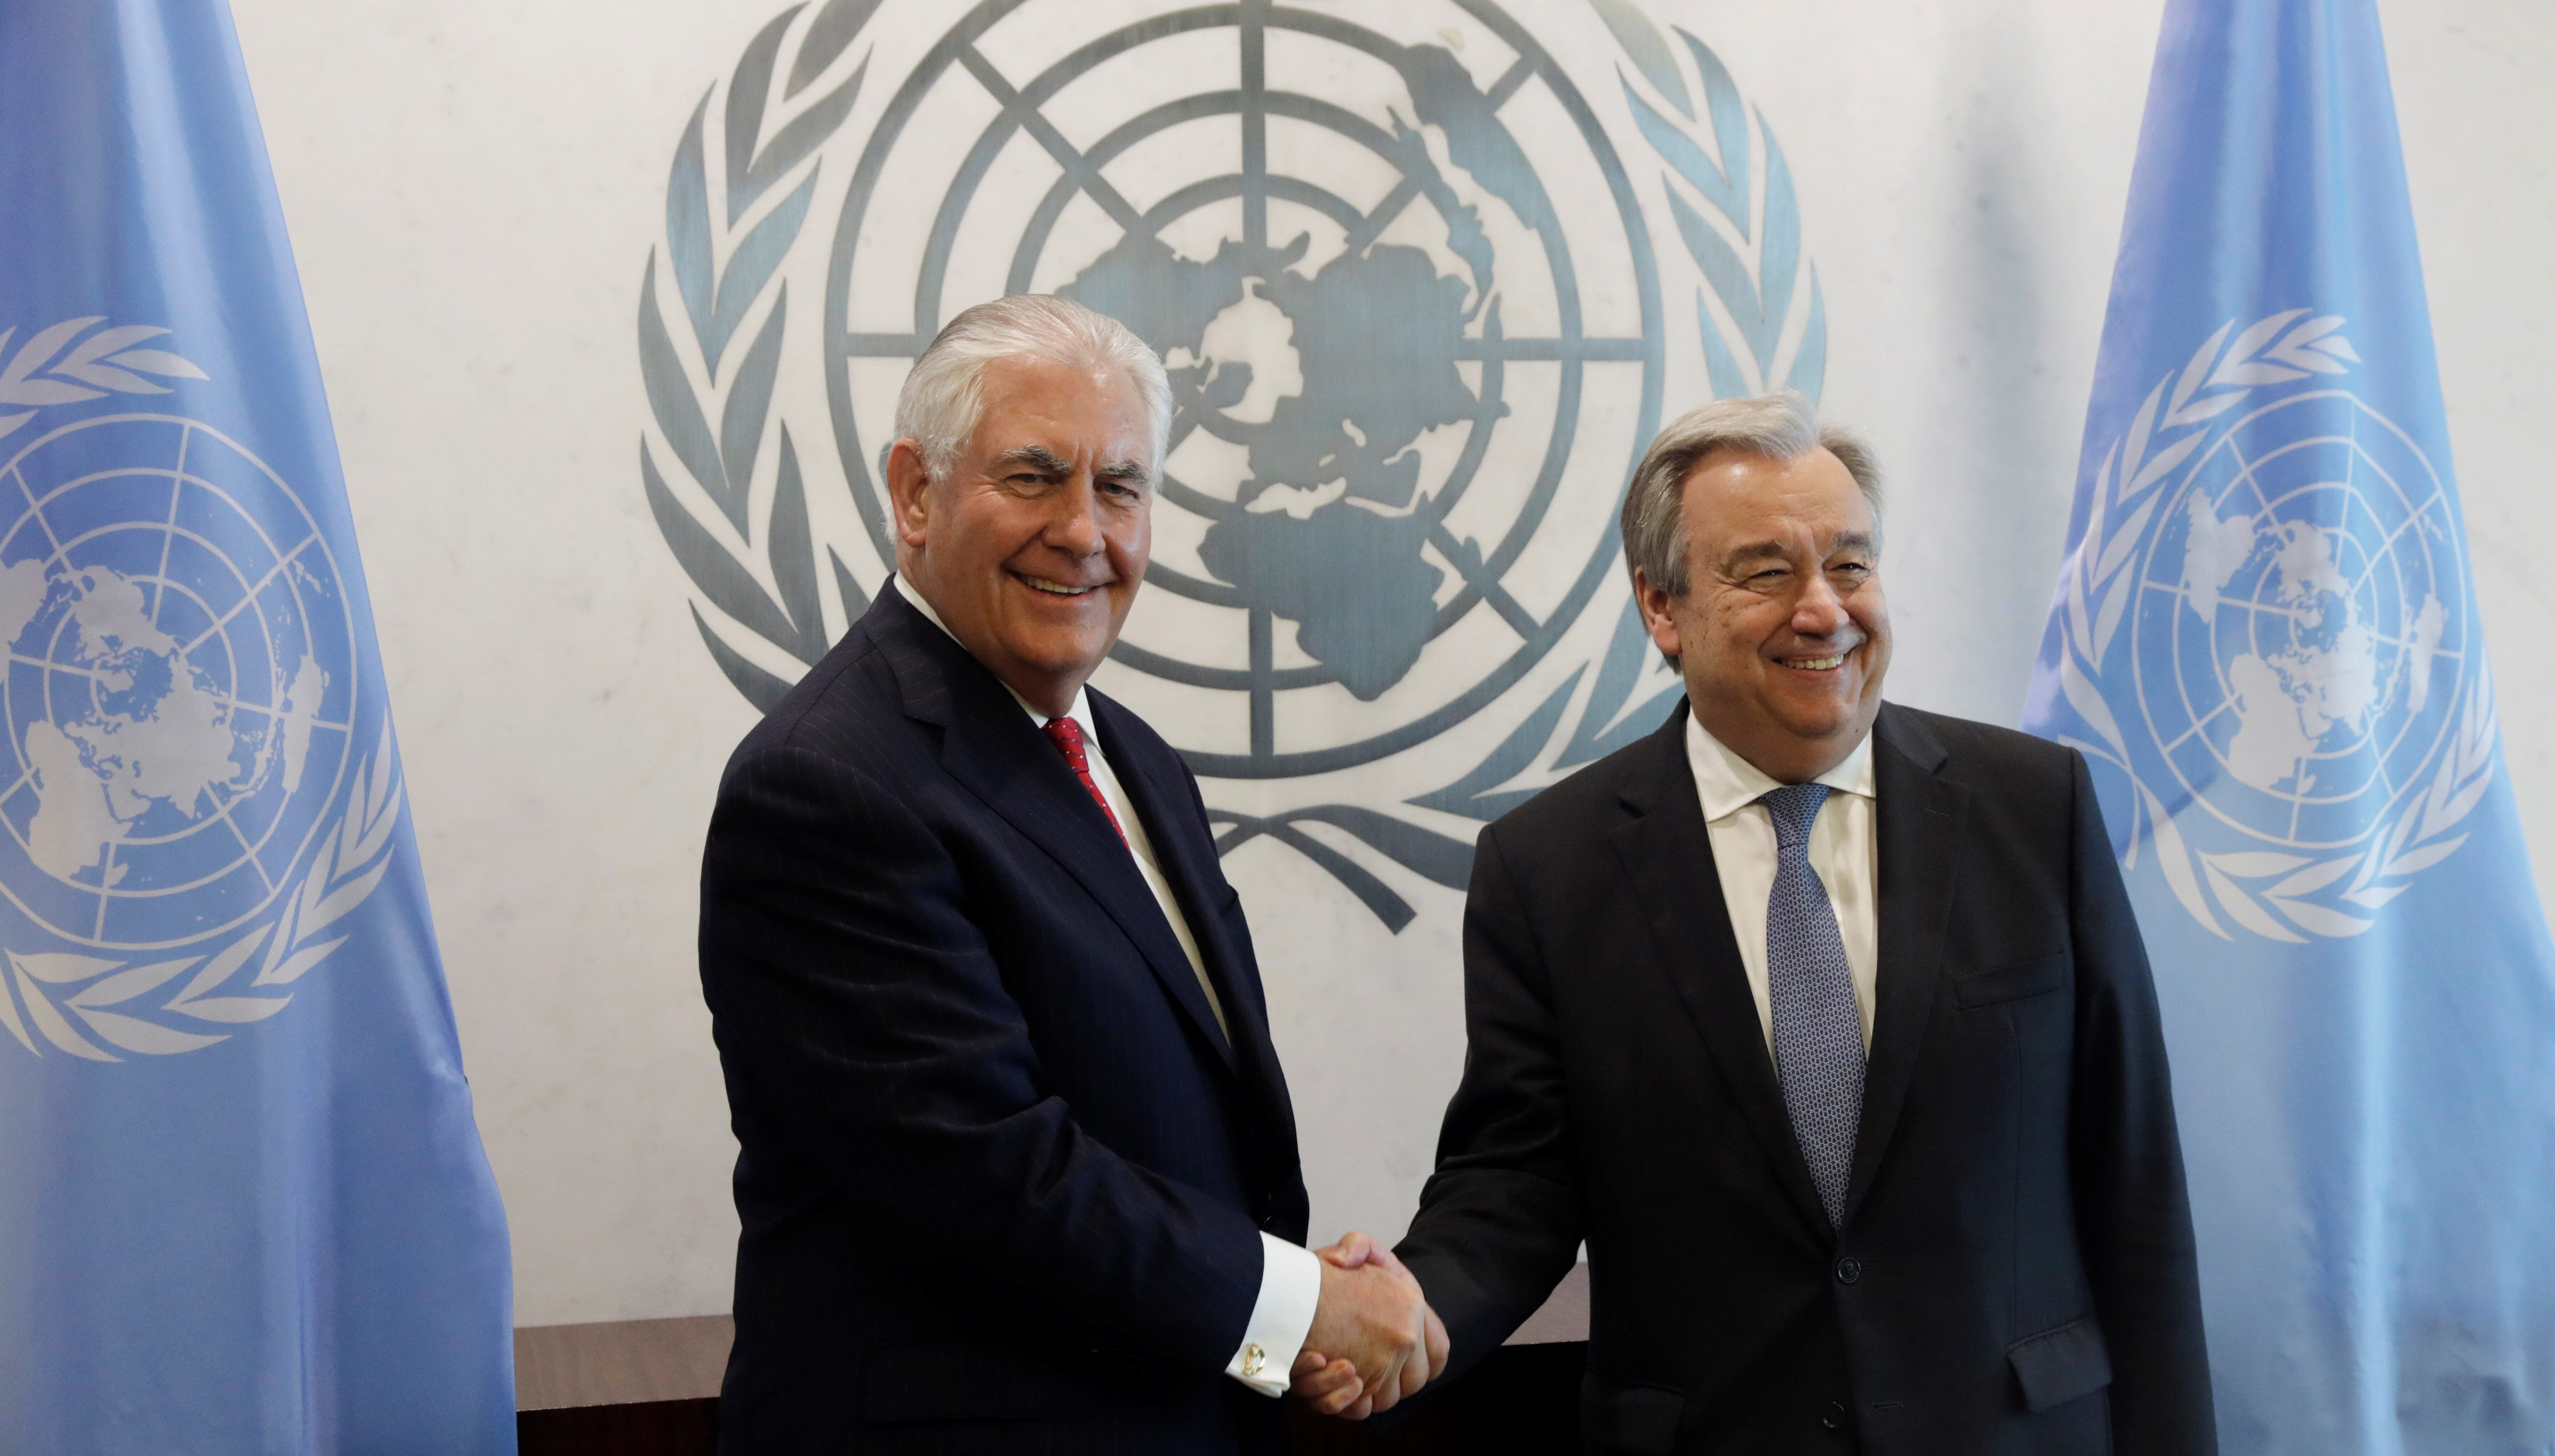 U.S. Secretary of State Rex Tillerson (L) greets UN Secretary General Antonio Guterres at United Nations (UN) headquarters in New York City, NY, U.S. April 28, 2017. REUTERS/Lucas Jackson - RTS14E10